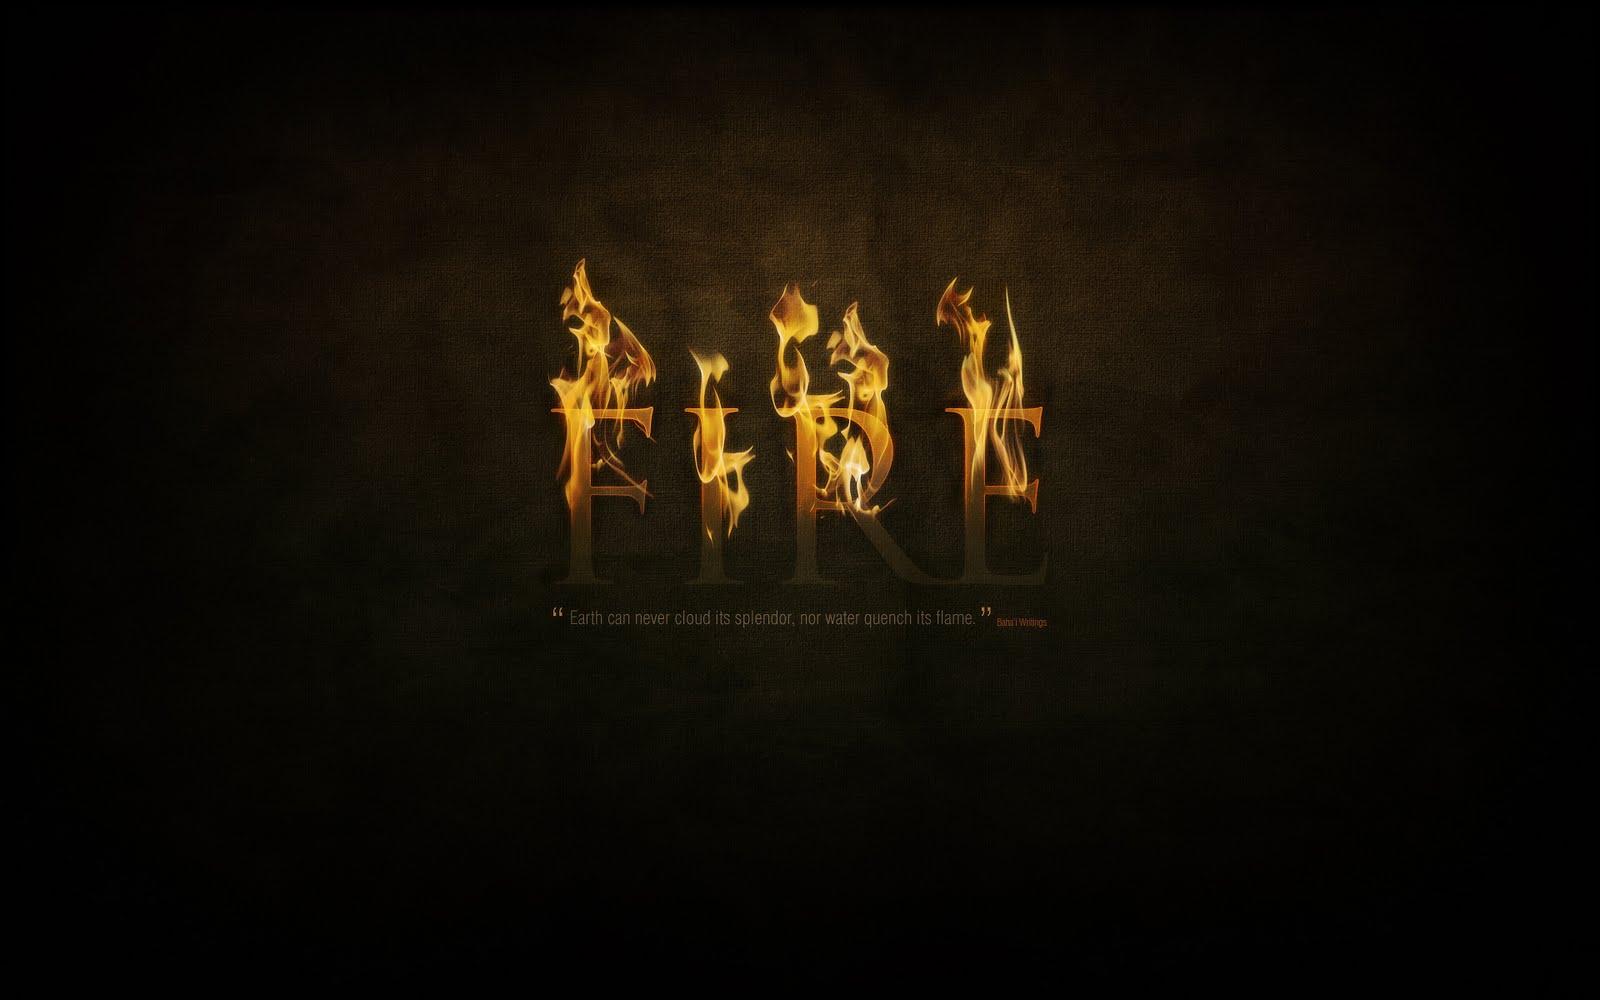 http://4.bp.blogspot.com/-bE_CMDBSq7M/TmiOQNBfVOI/AAAAAAAAALg/fzQIcGpMQkA/s1600/wallpaper-3332.jpg